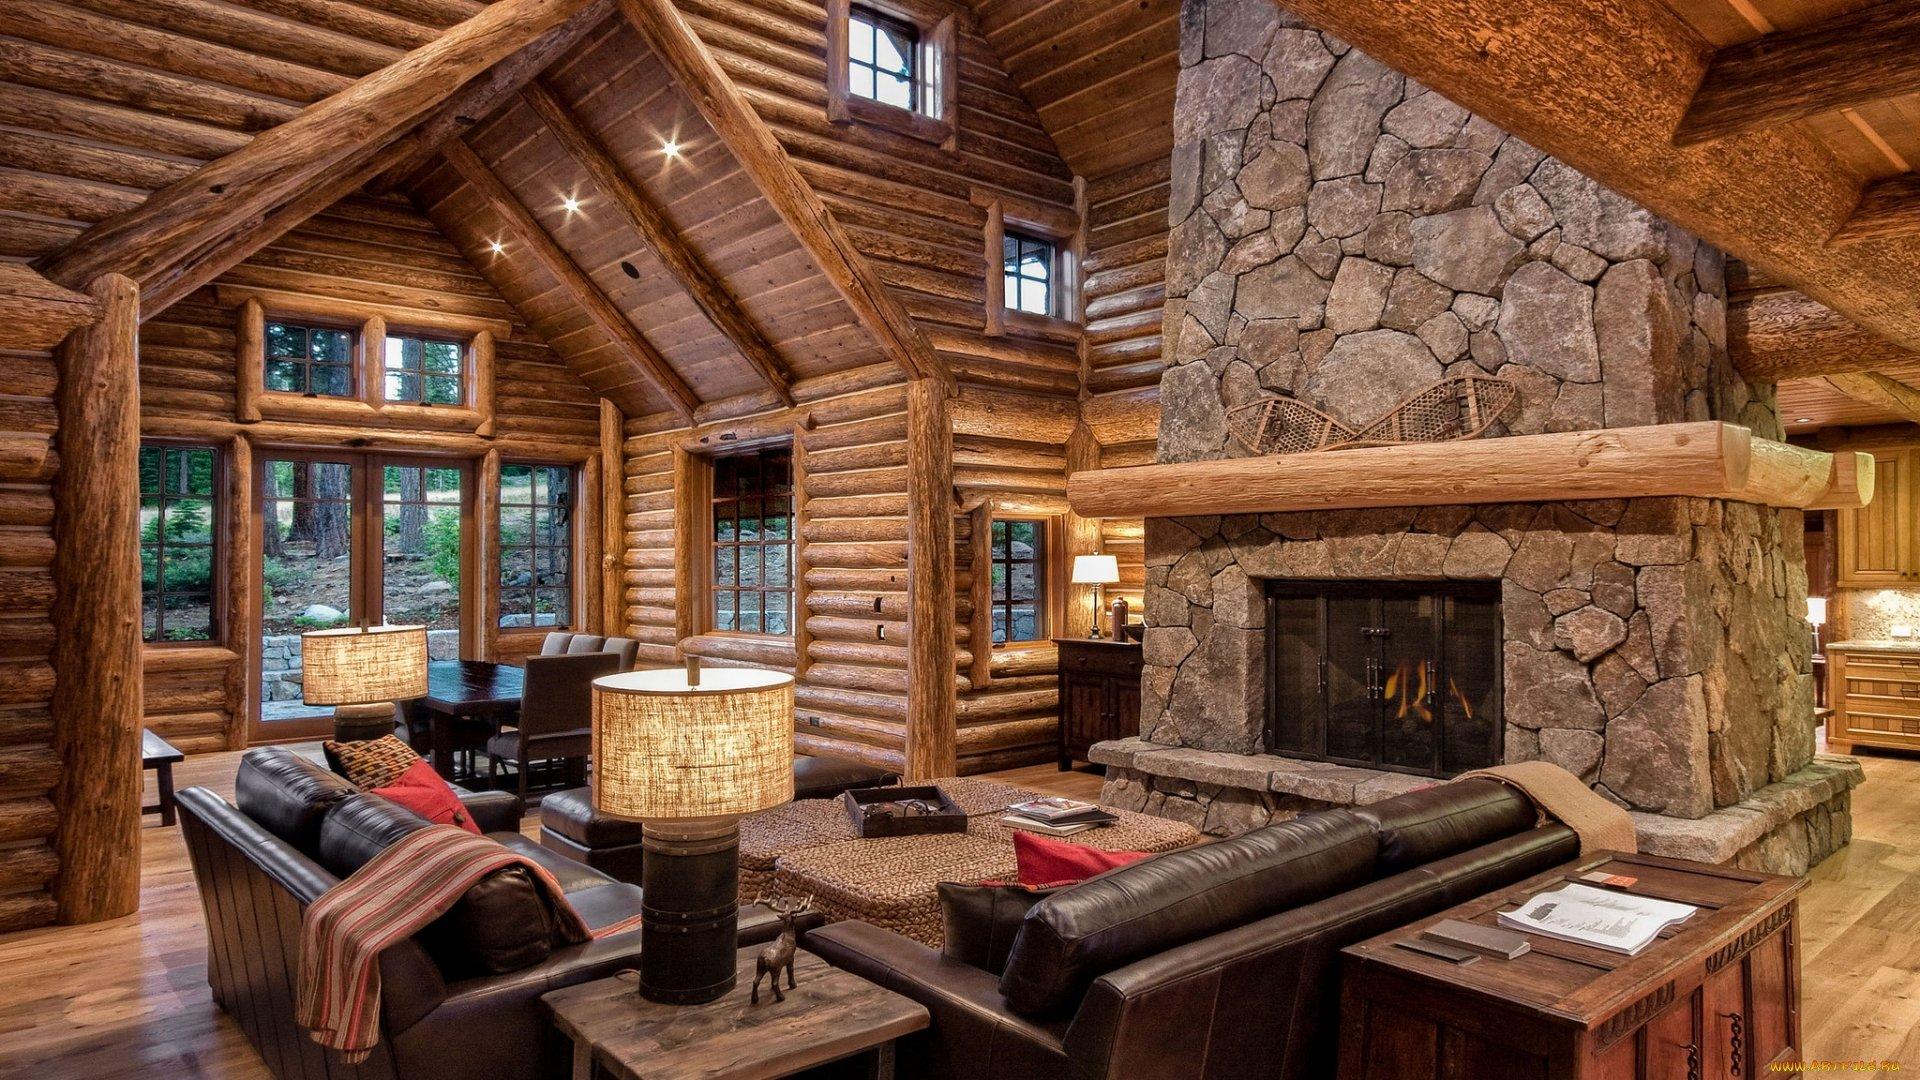 Interior design home room beautiful arhitecture wallpaper for Home room wallpaper